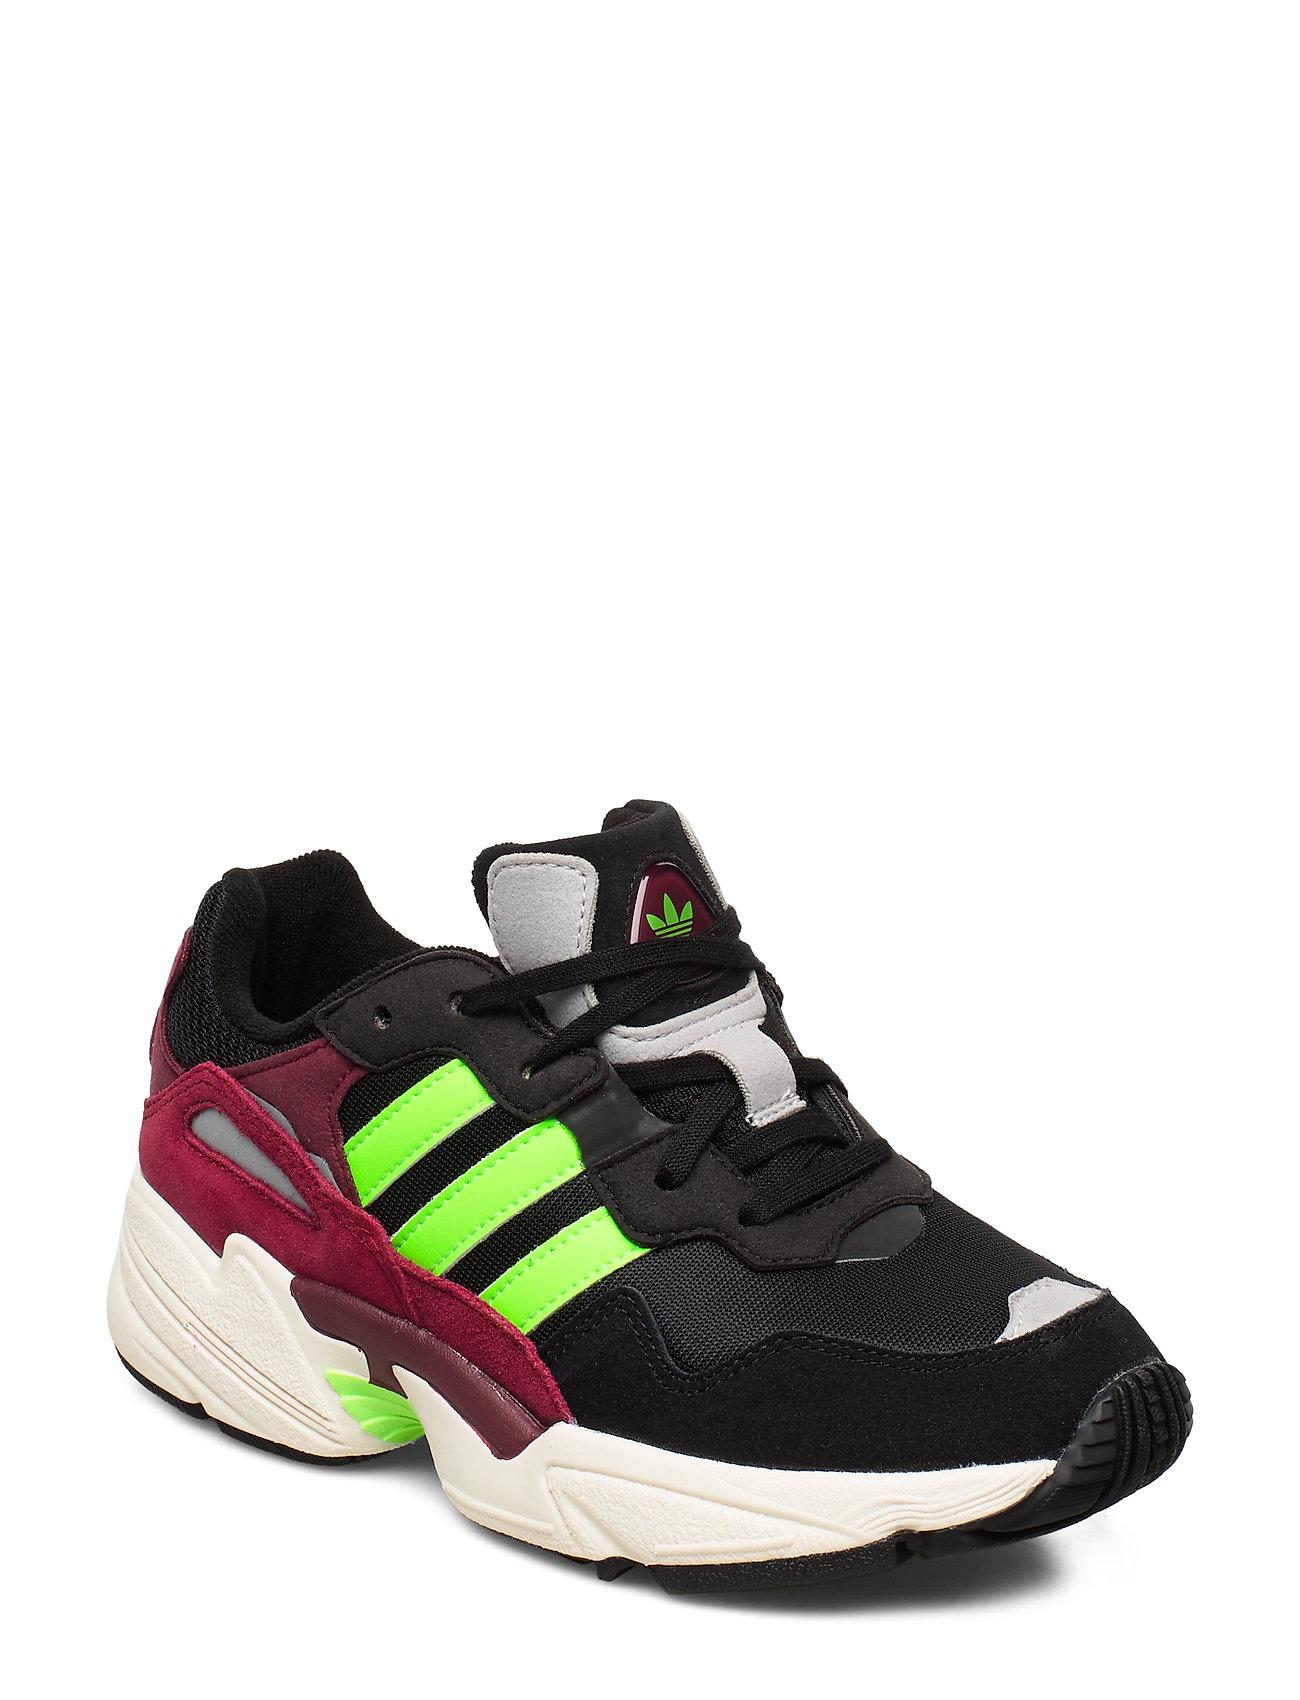 adidas Originals YUNG-96 J - CBLACK/SGREEN/CBURGU